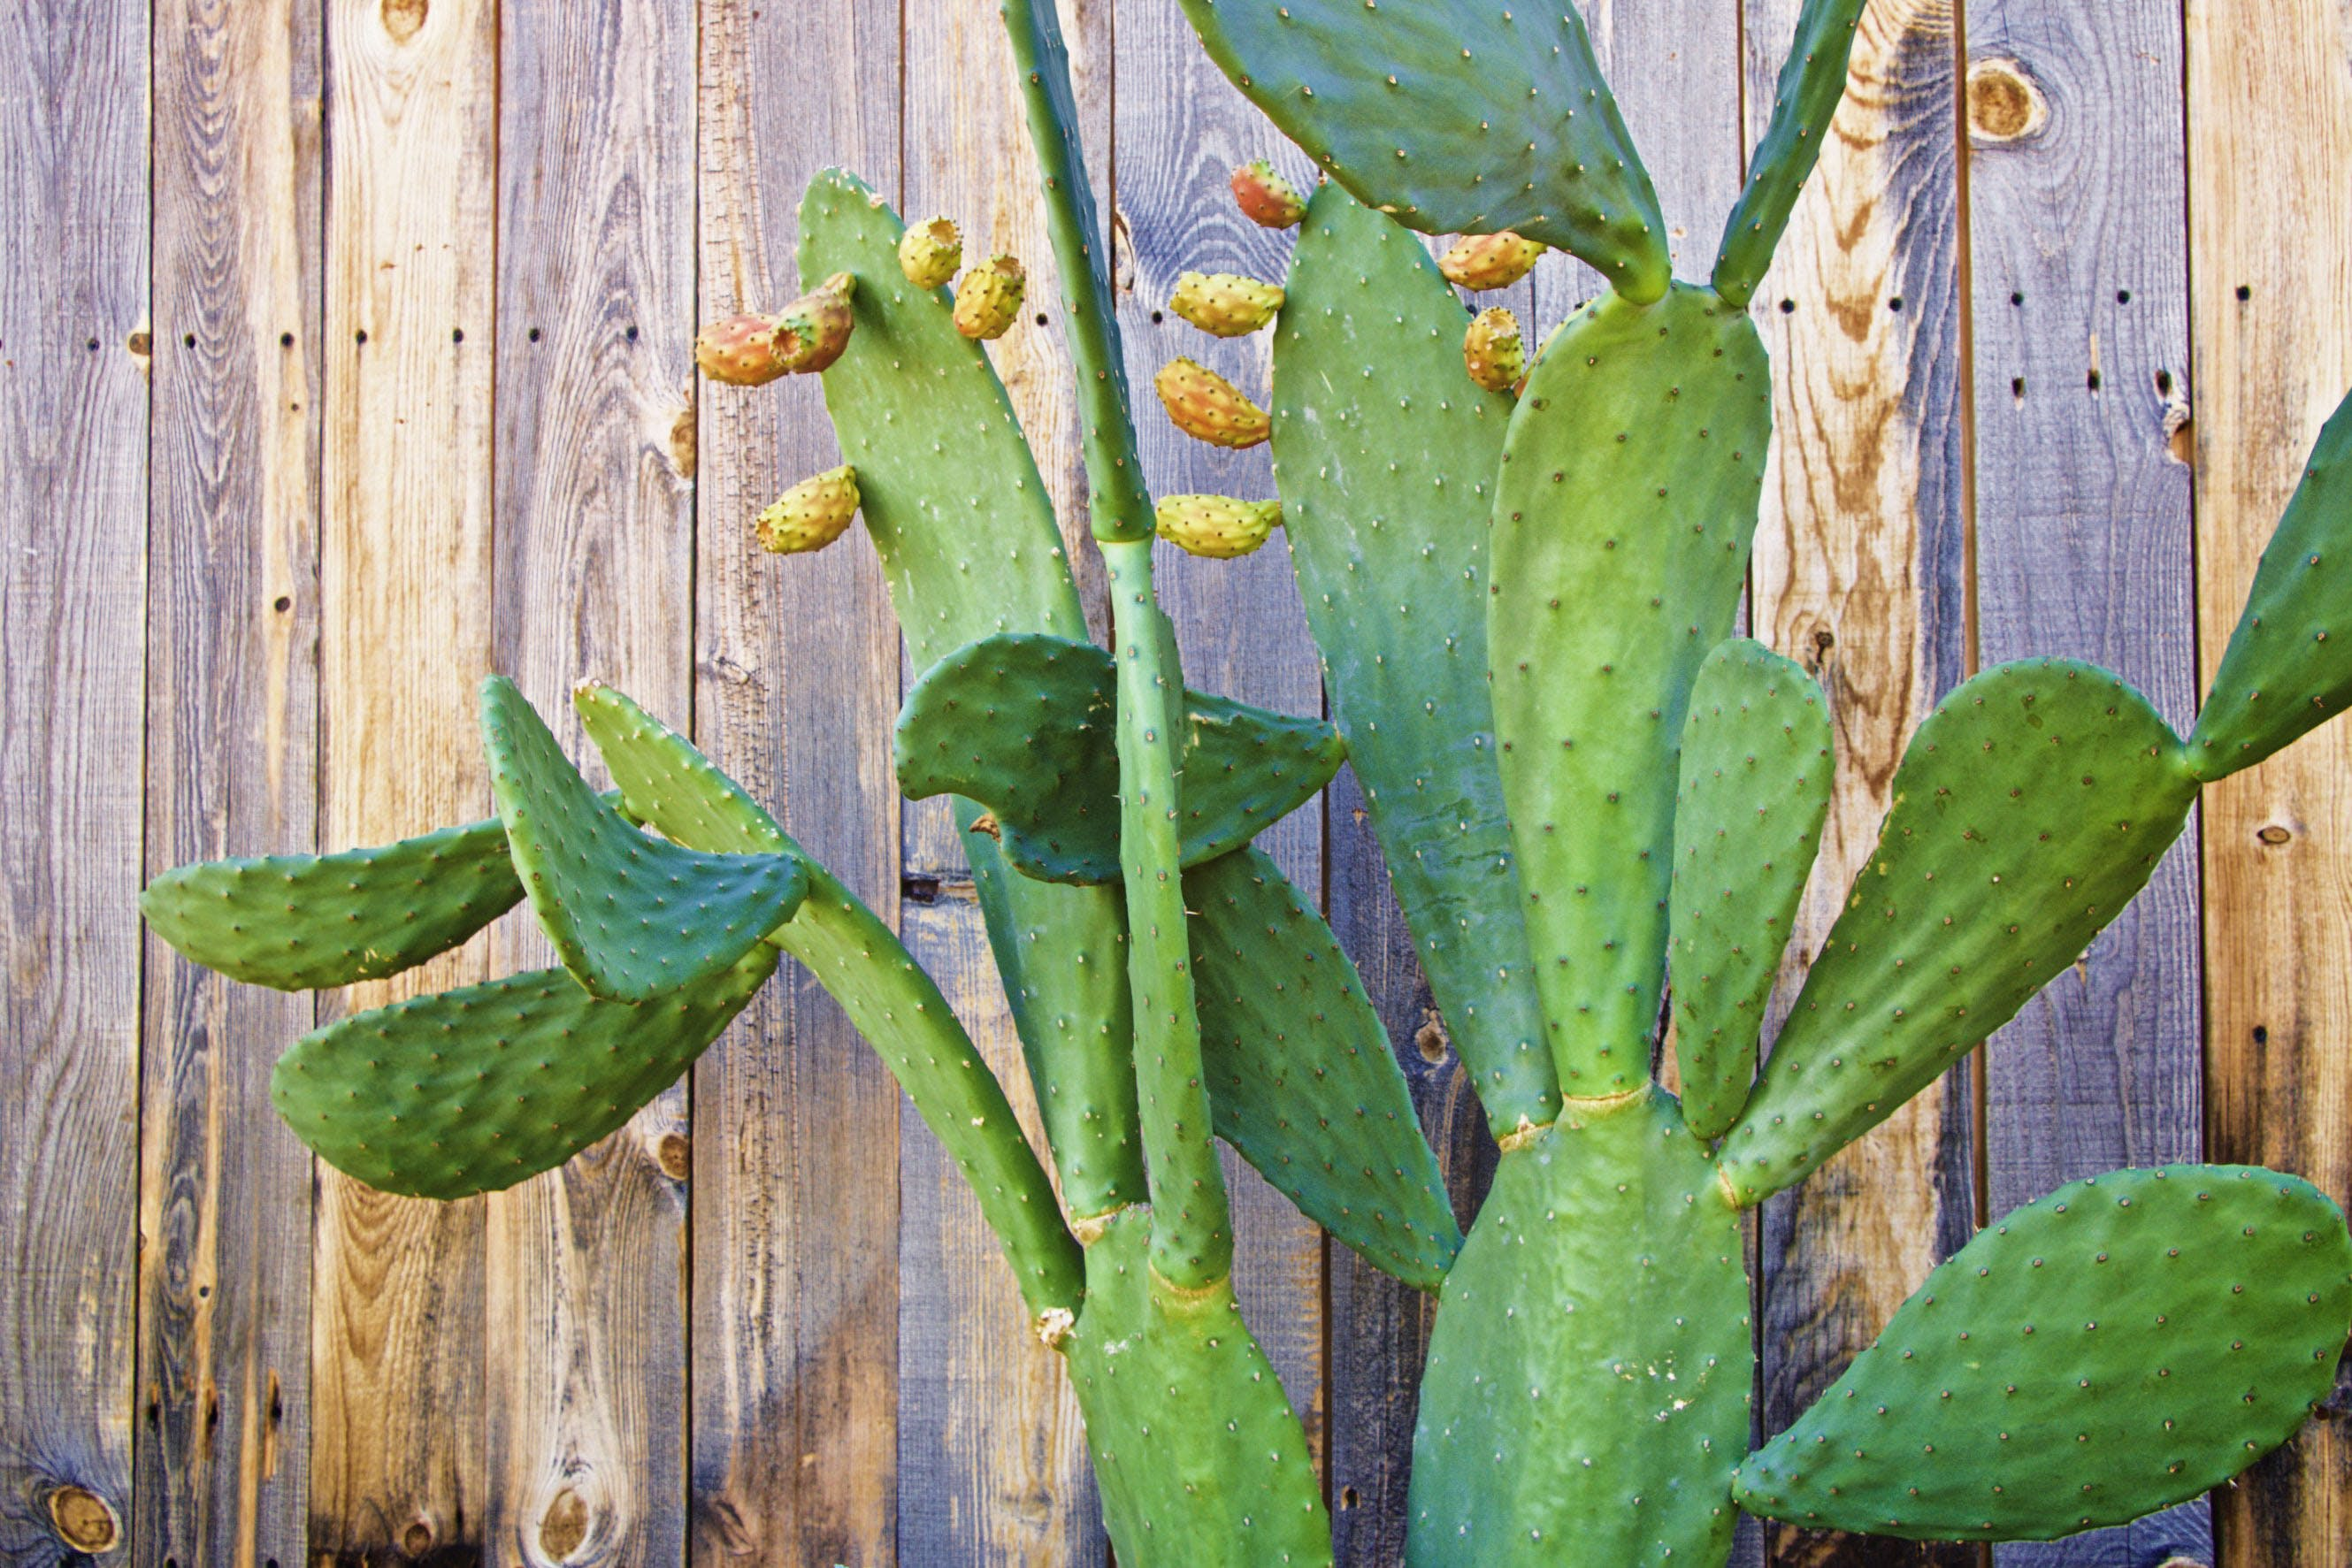 Free stock photo of wood, plant, fence, cactus